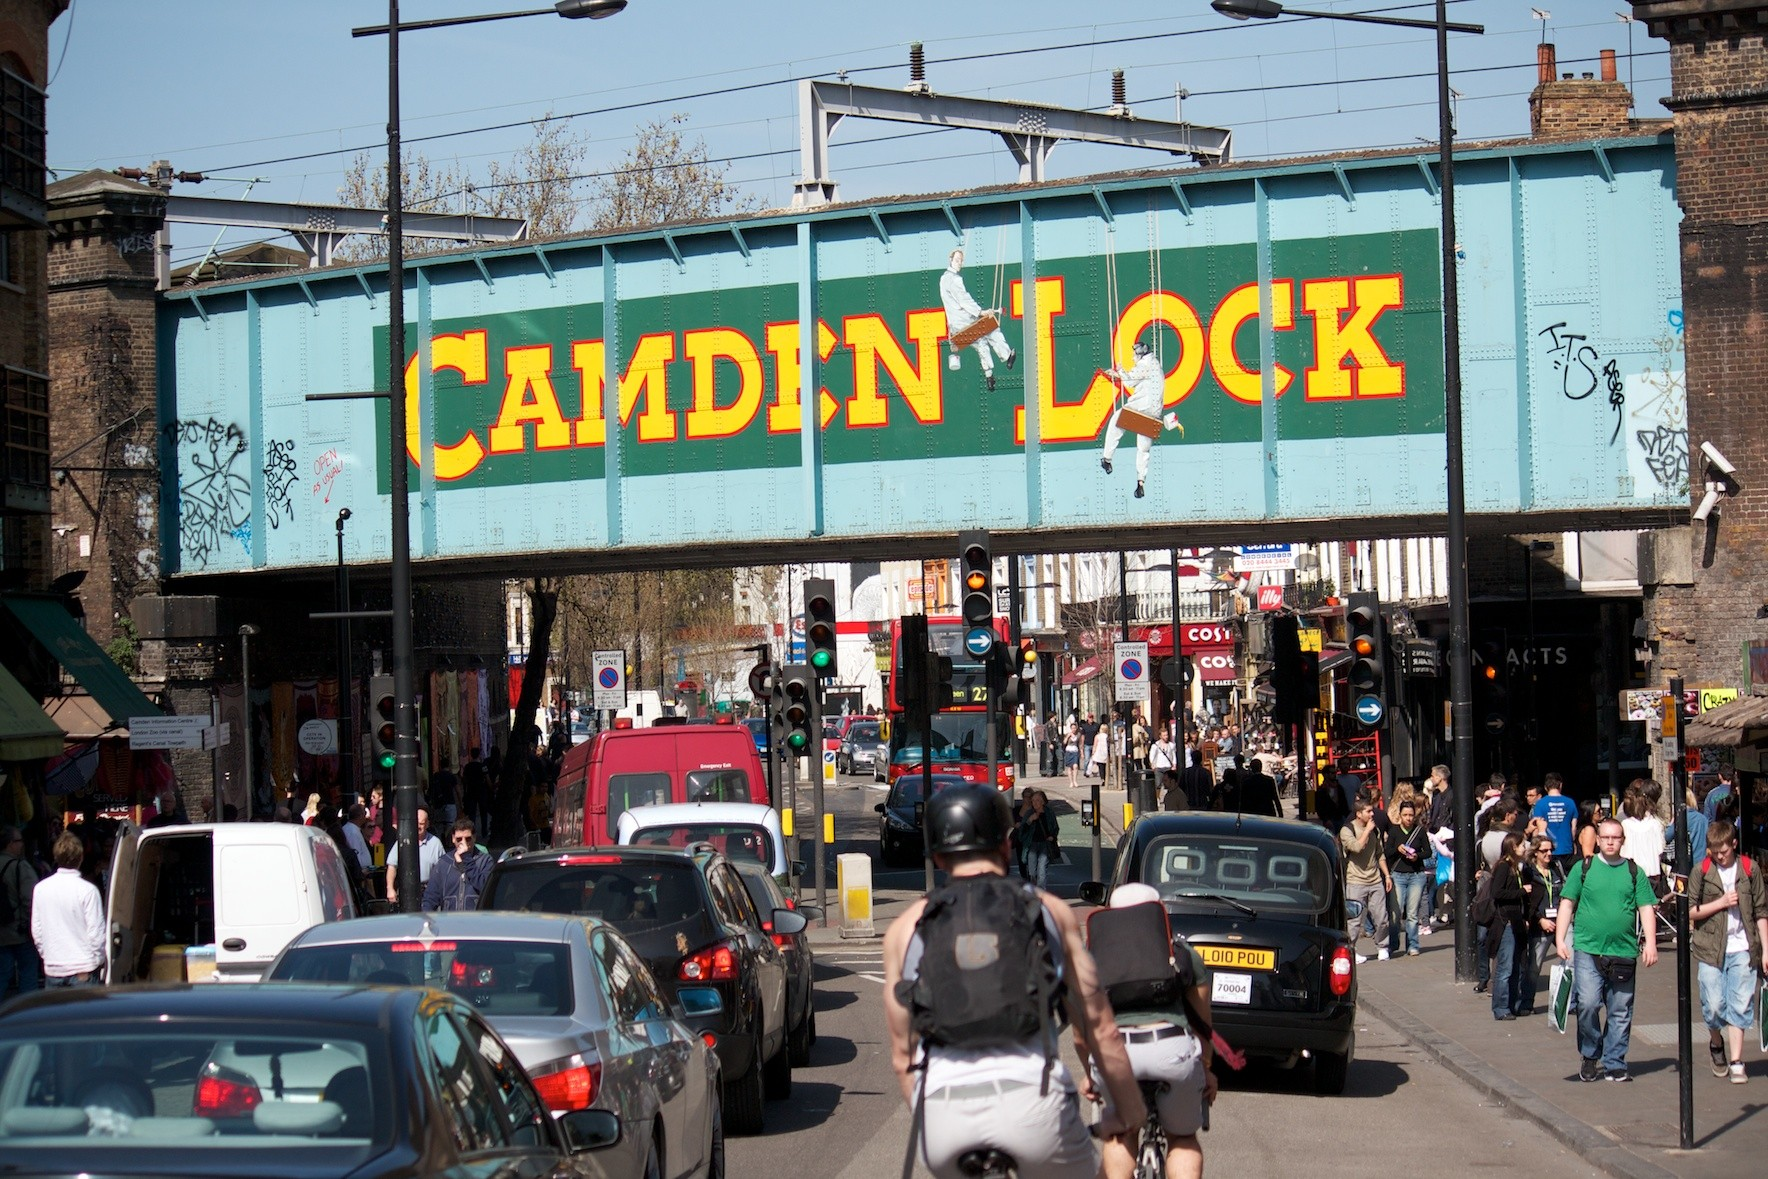 ... camden lock lock bridge locks uk trips stomping grounds forward camden